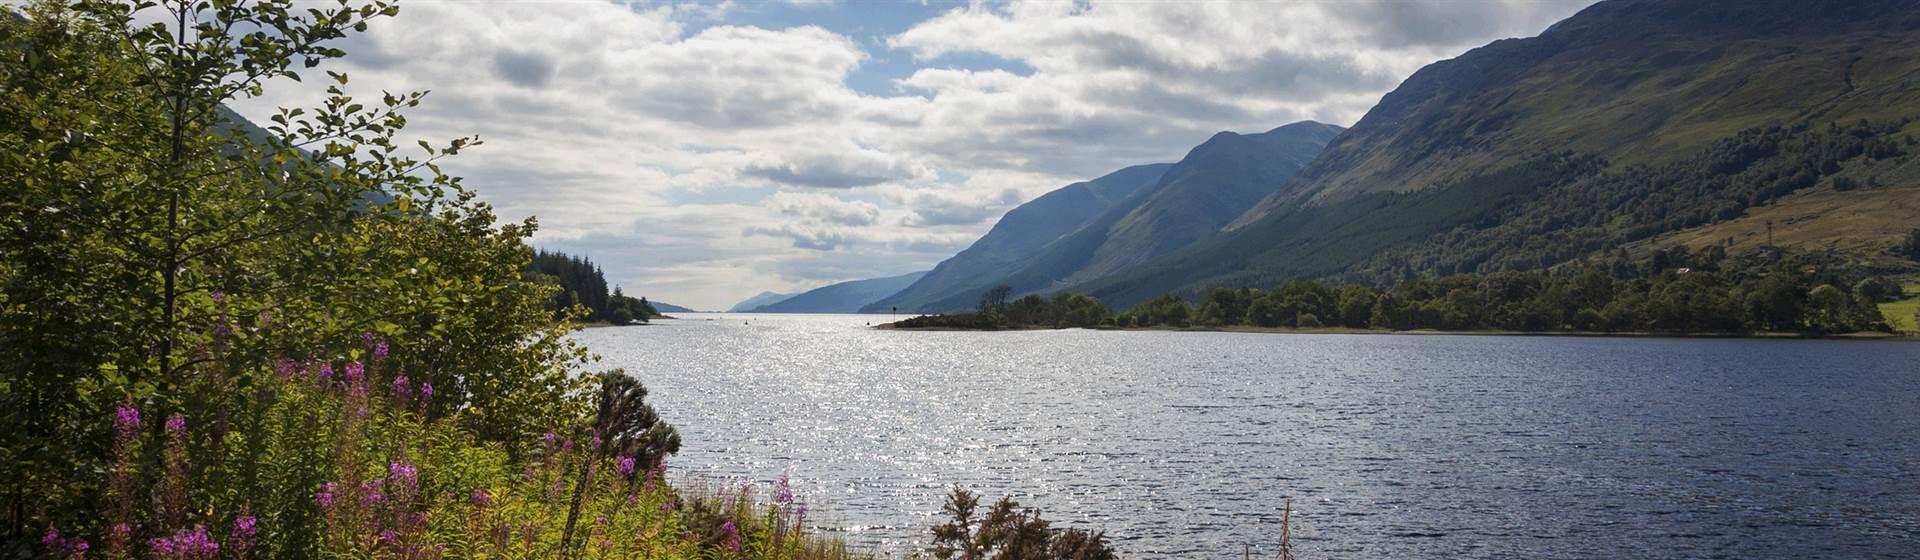 Scottish Highlands and Loch Ness